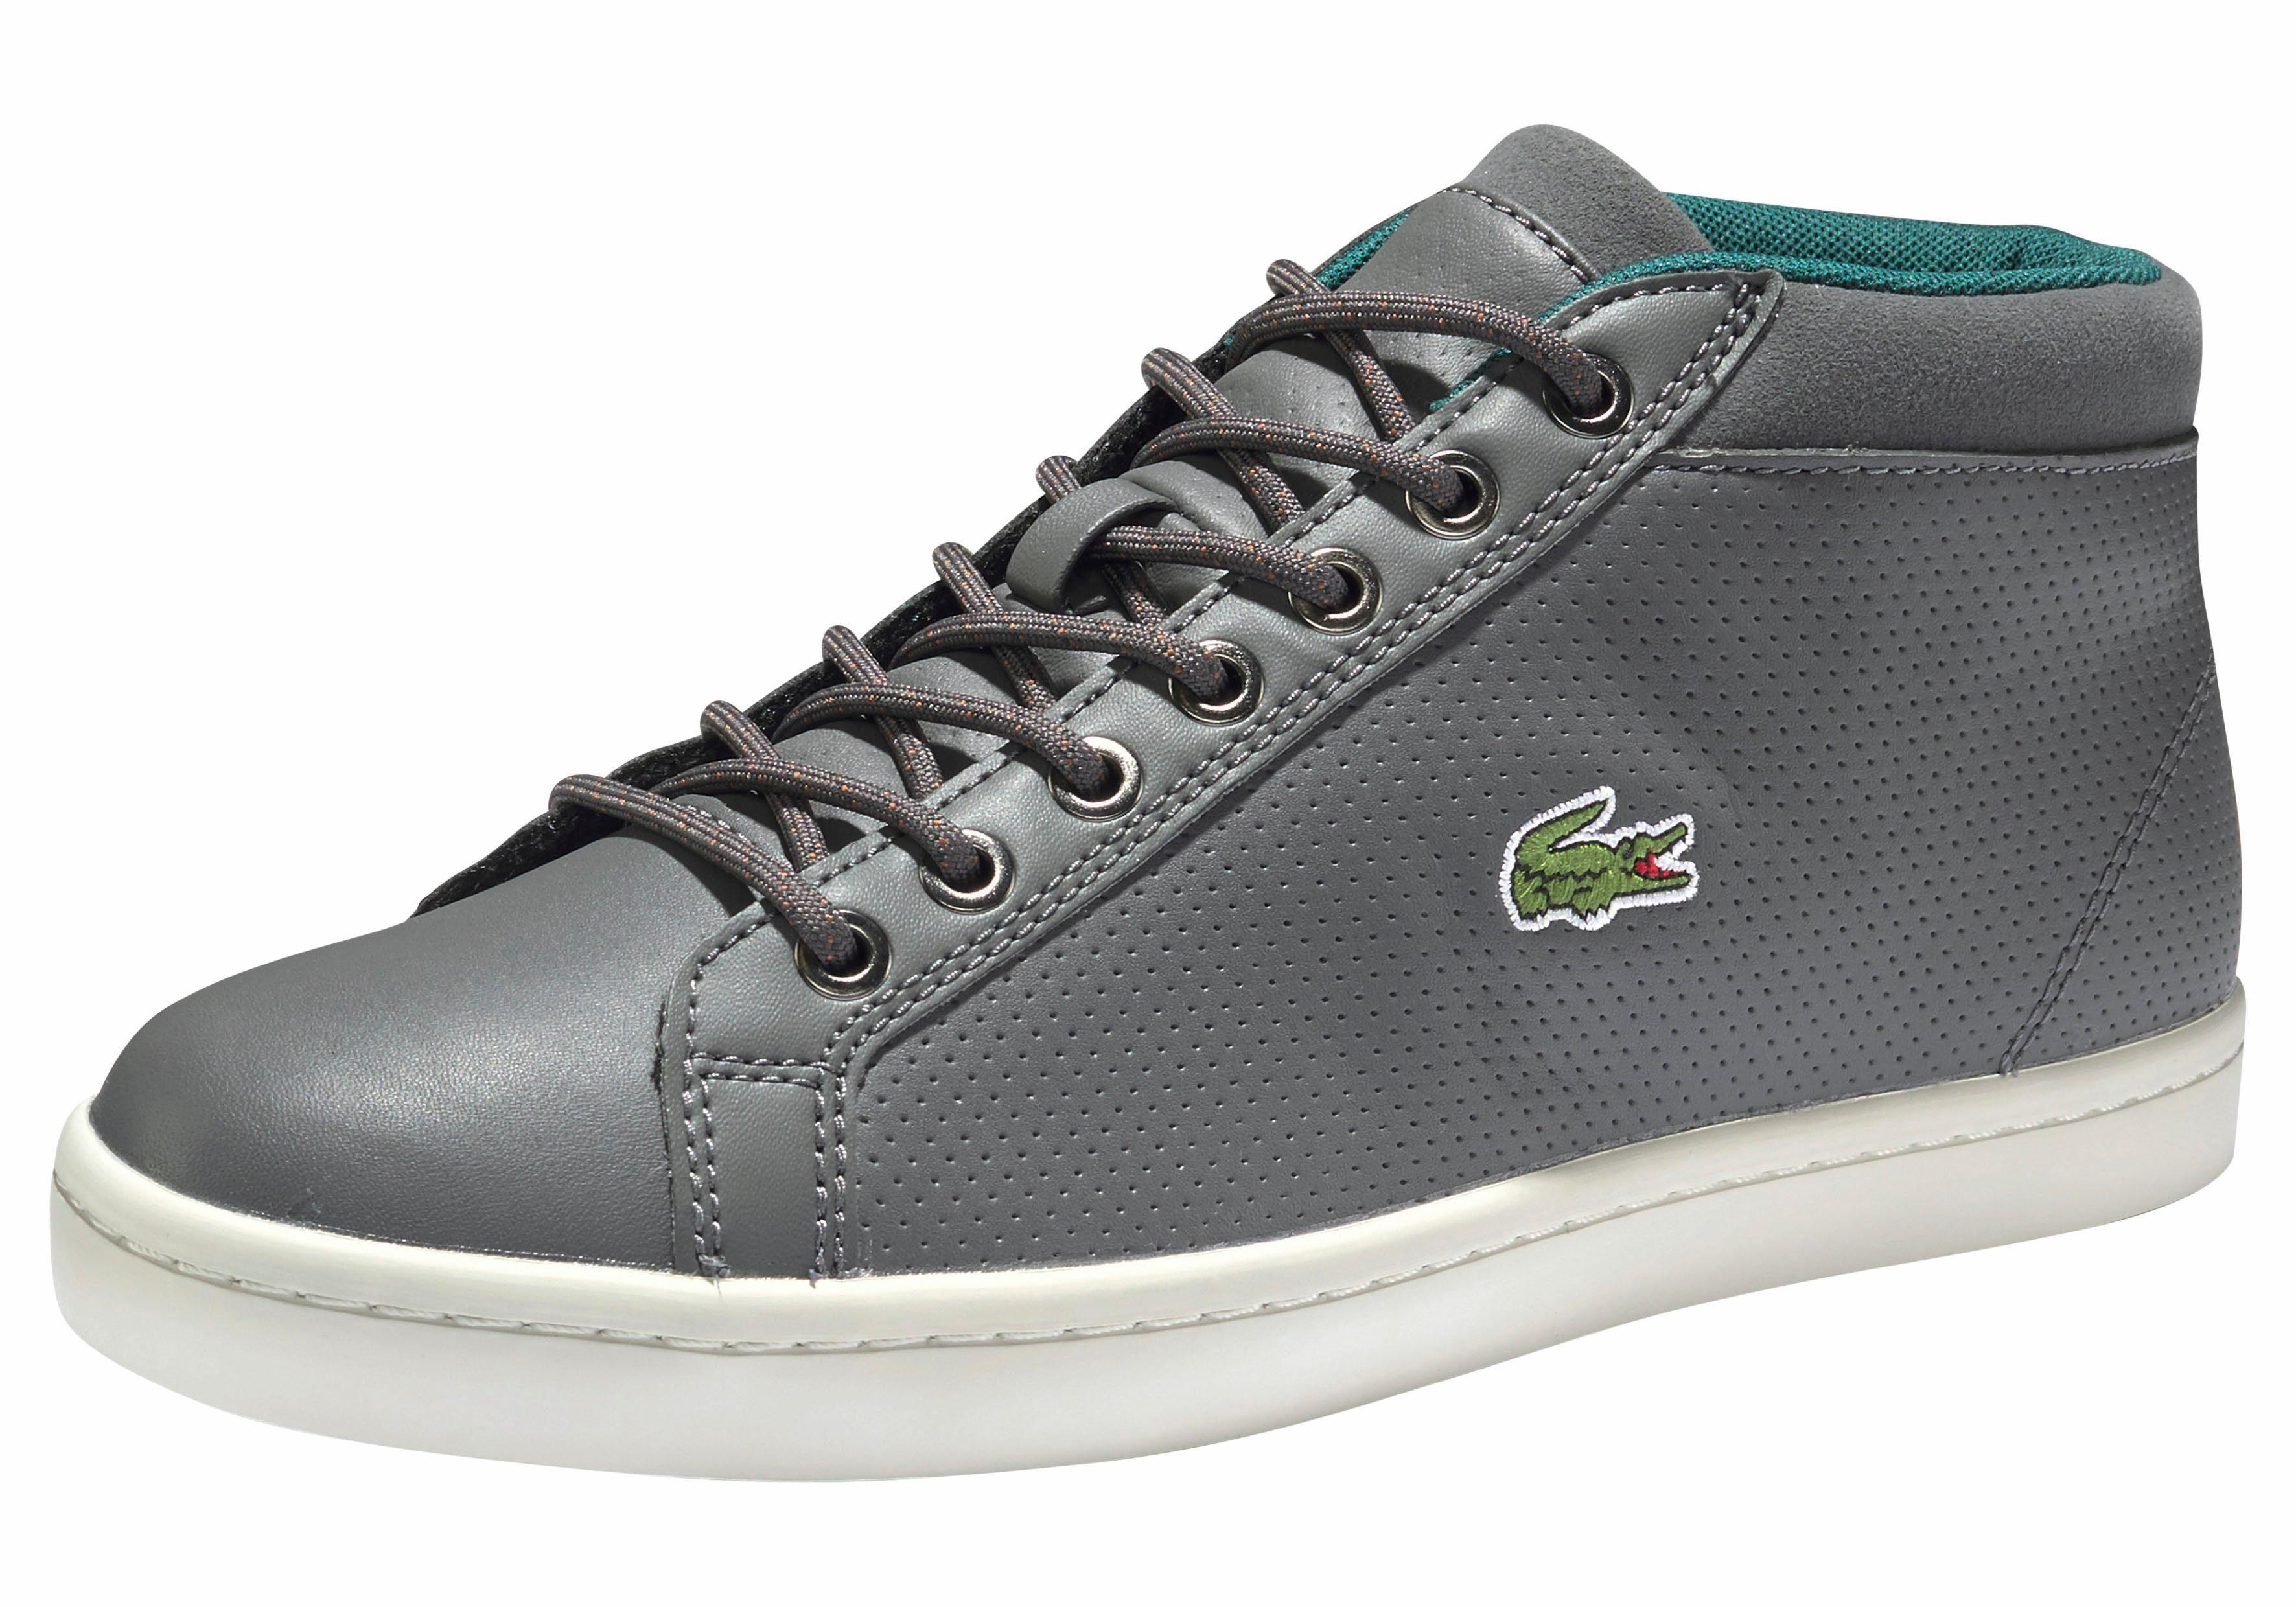 Chaussures De Sport Lacoste Haute 'straightset Sp Chukka' Dark shhQI1qT1y